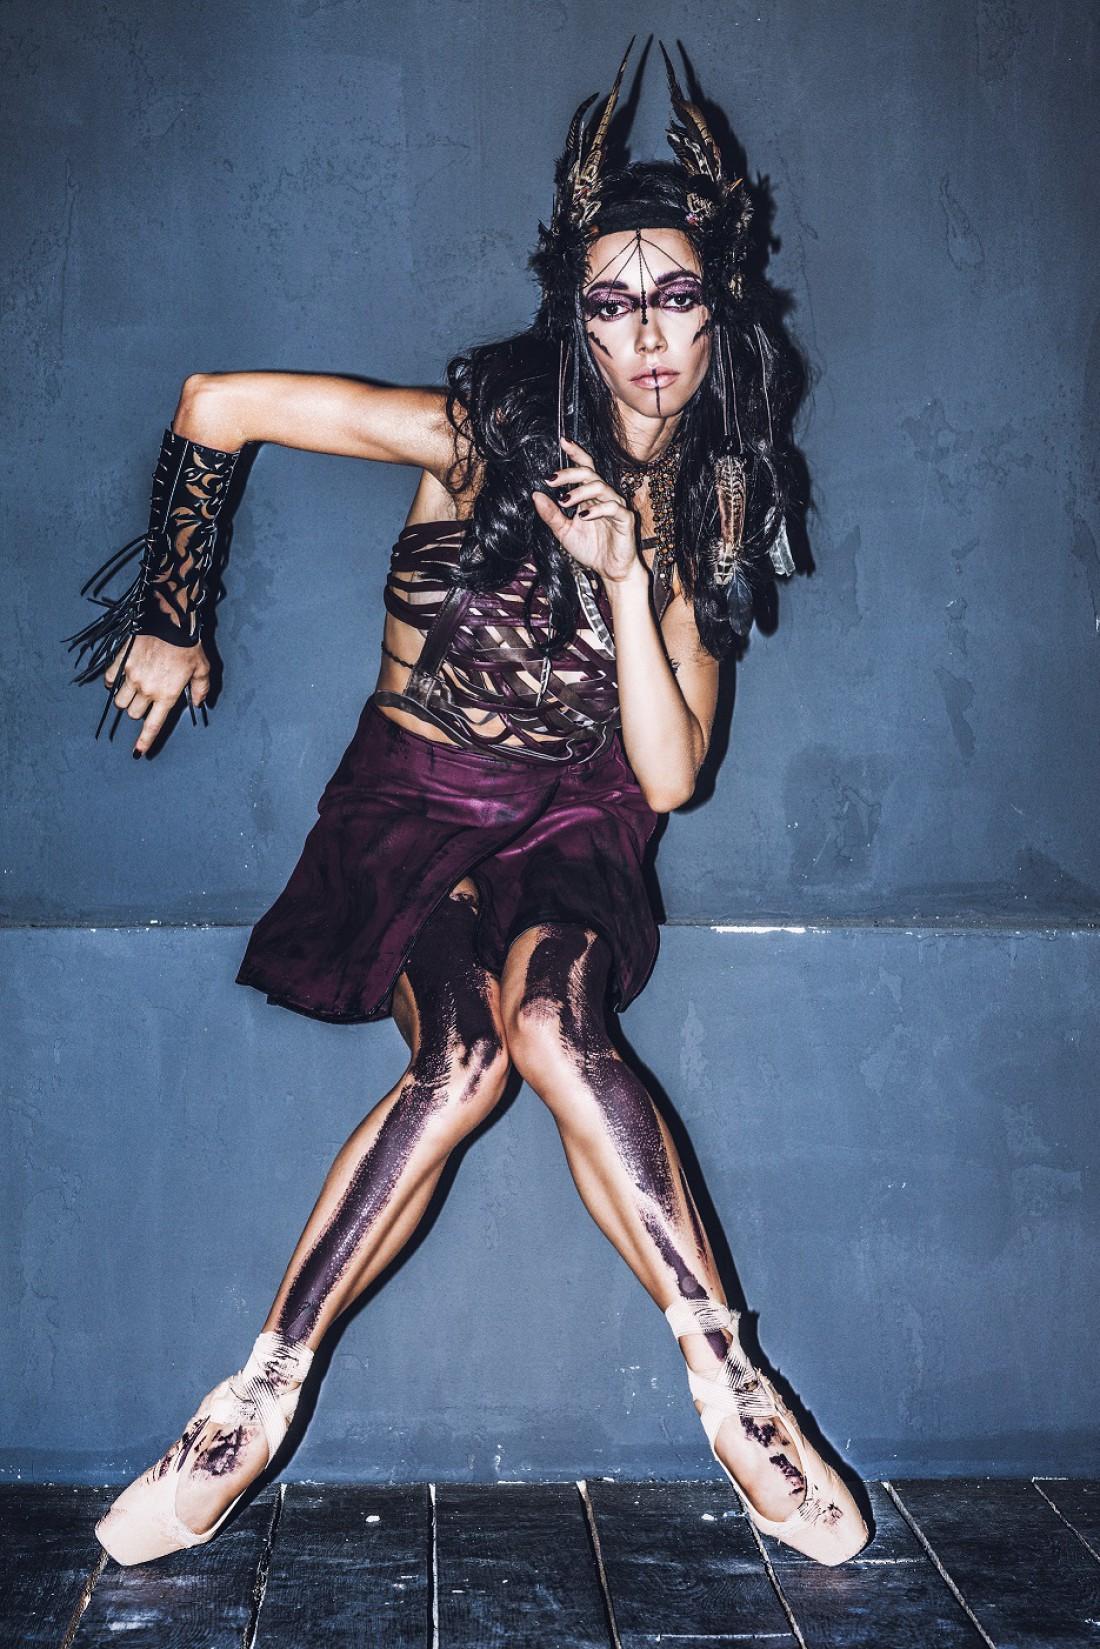 Образ на Хэллоуин: женщина-воин